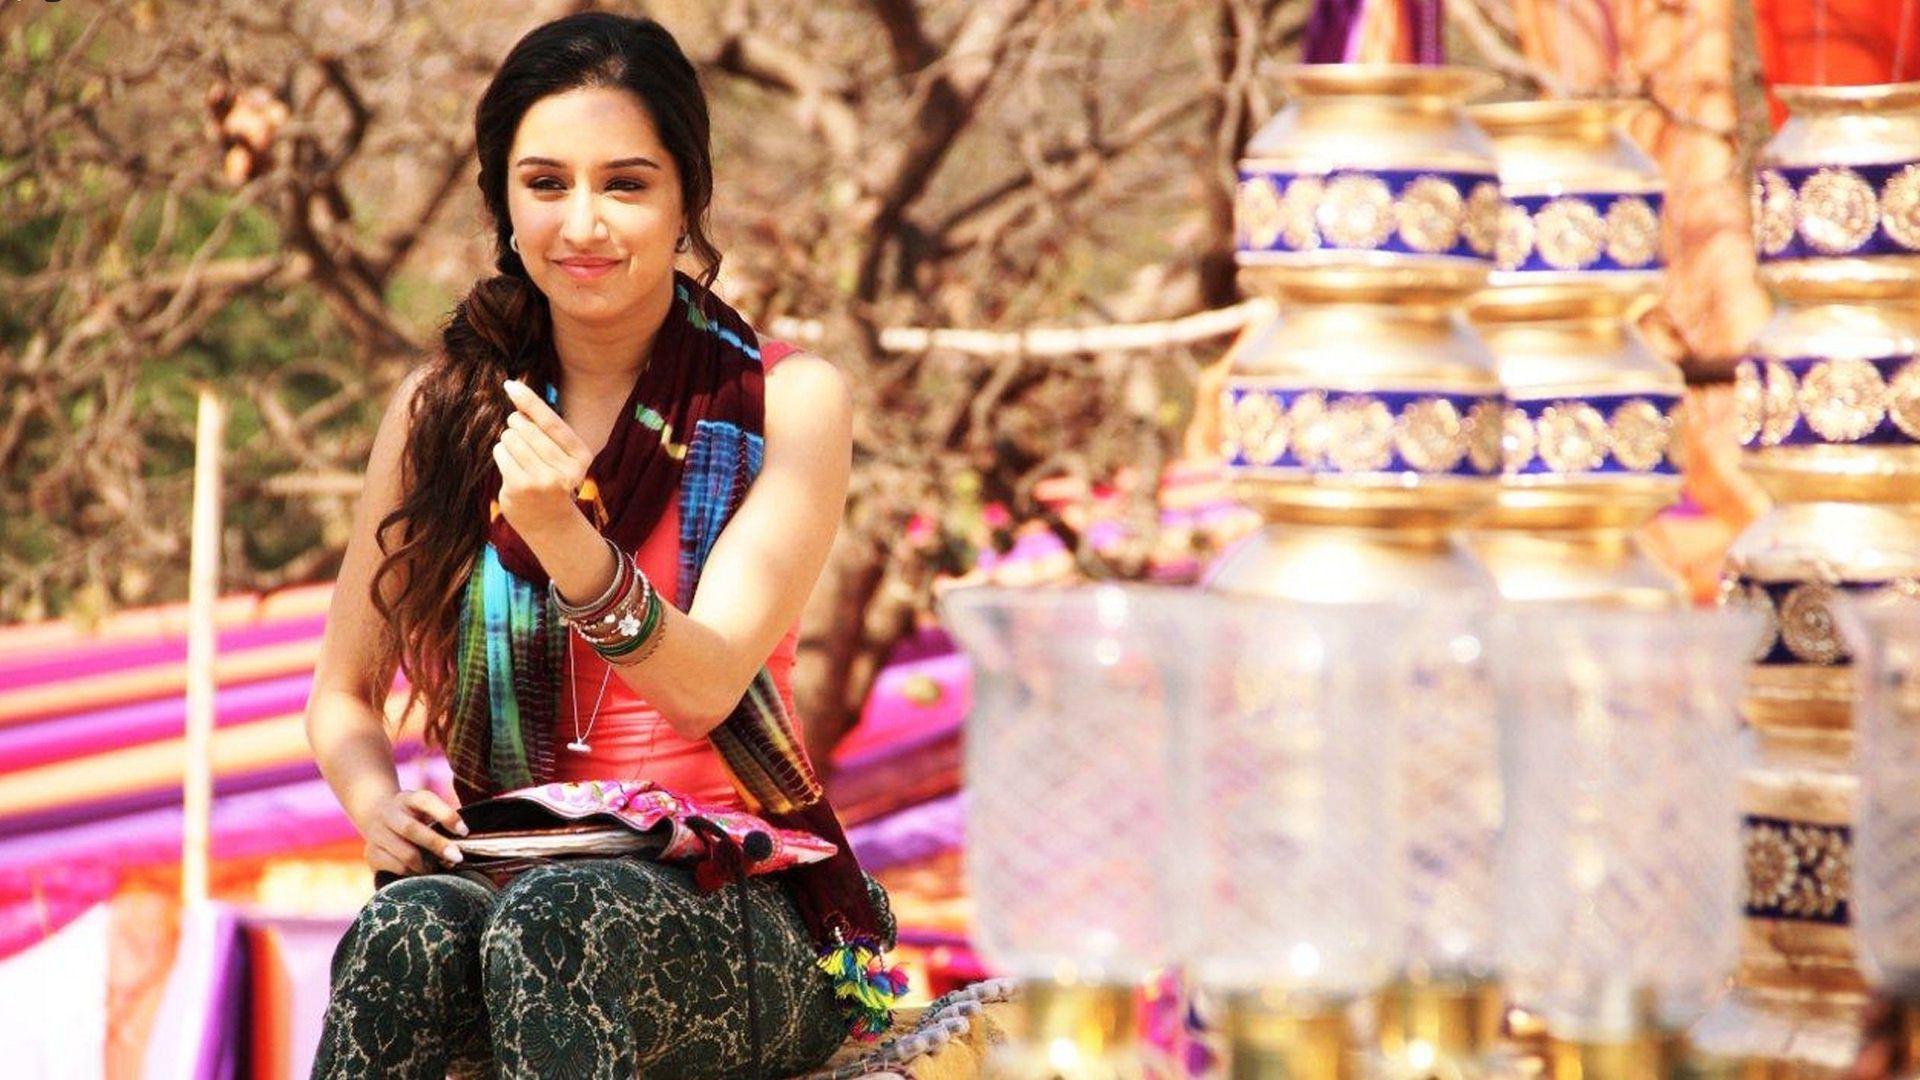 Shraddha Kapoor Images Hd Download 1080p Shradhha Kapoor